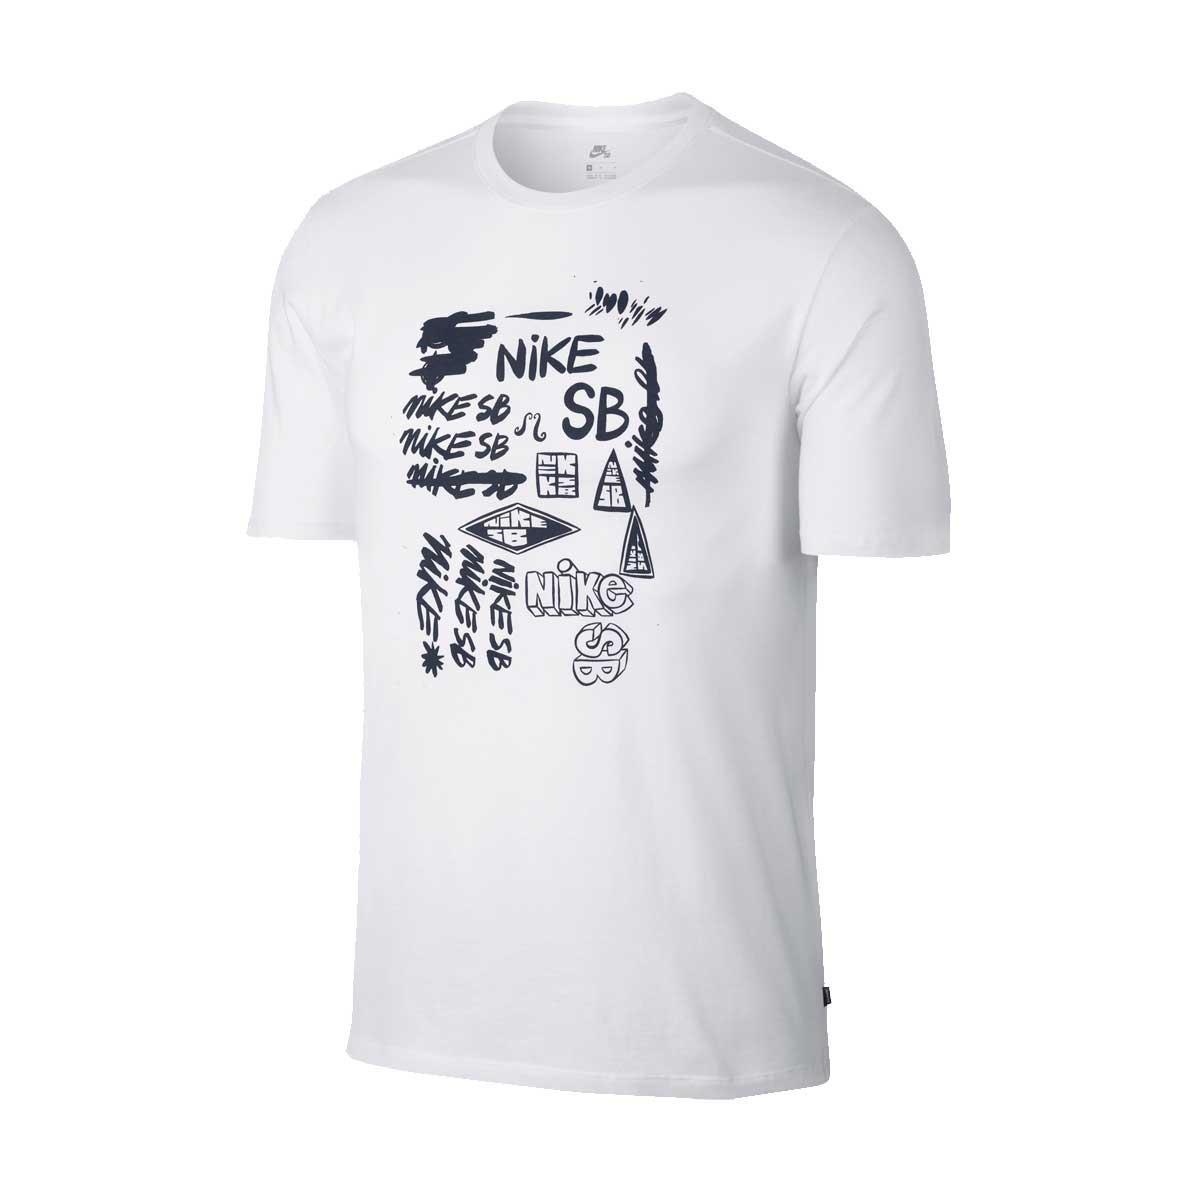 3a6b2f7ab1f56 Camiseta Nike Sb Art Masculino